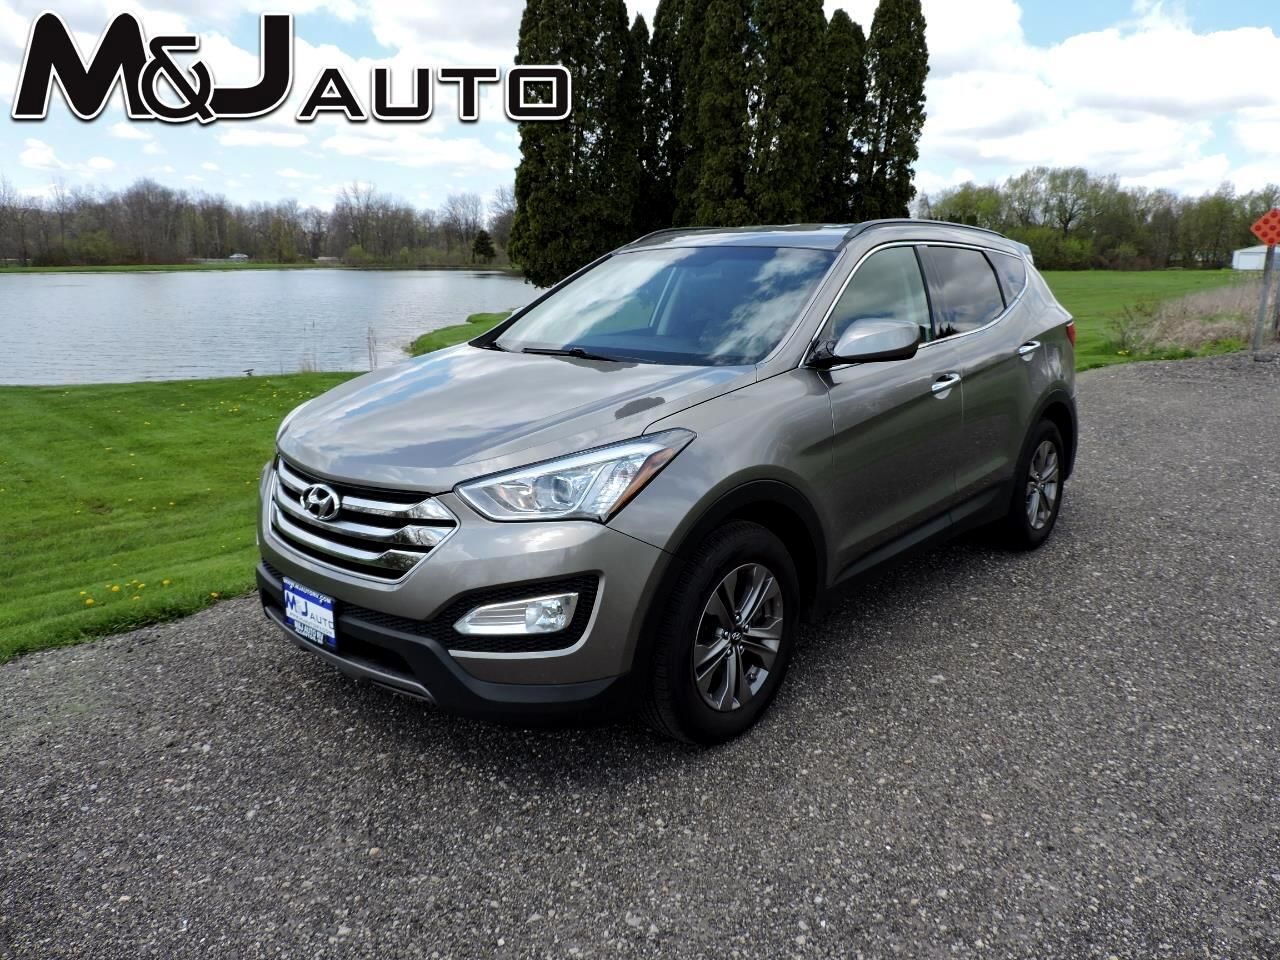 Hyundai Santa Fe FWD 4dr 2.4 2015